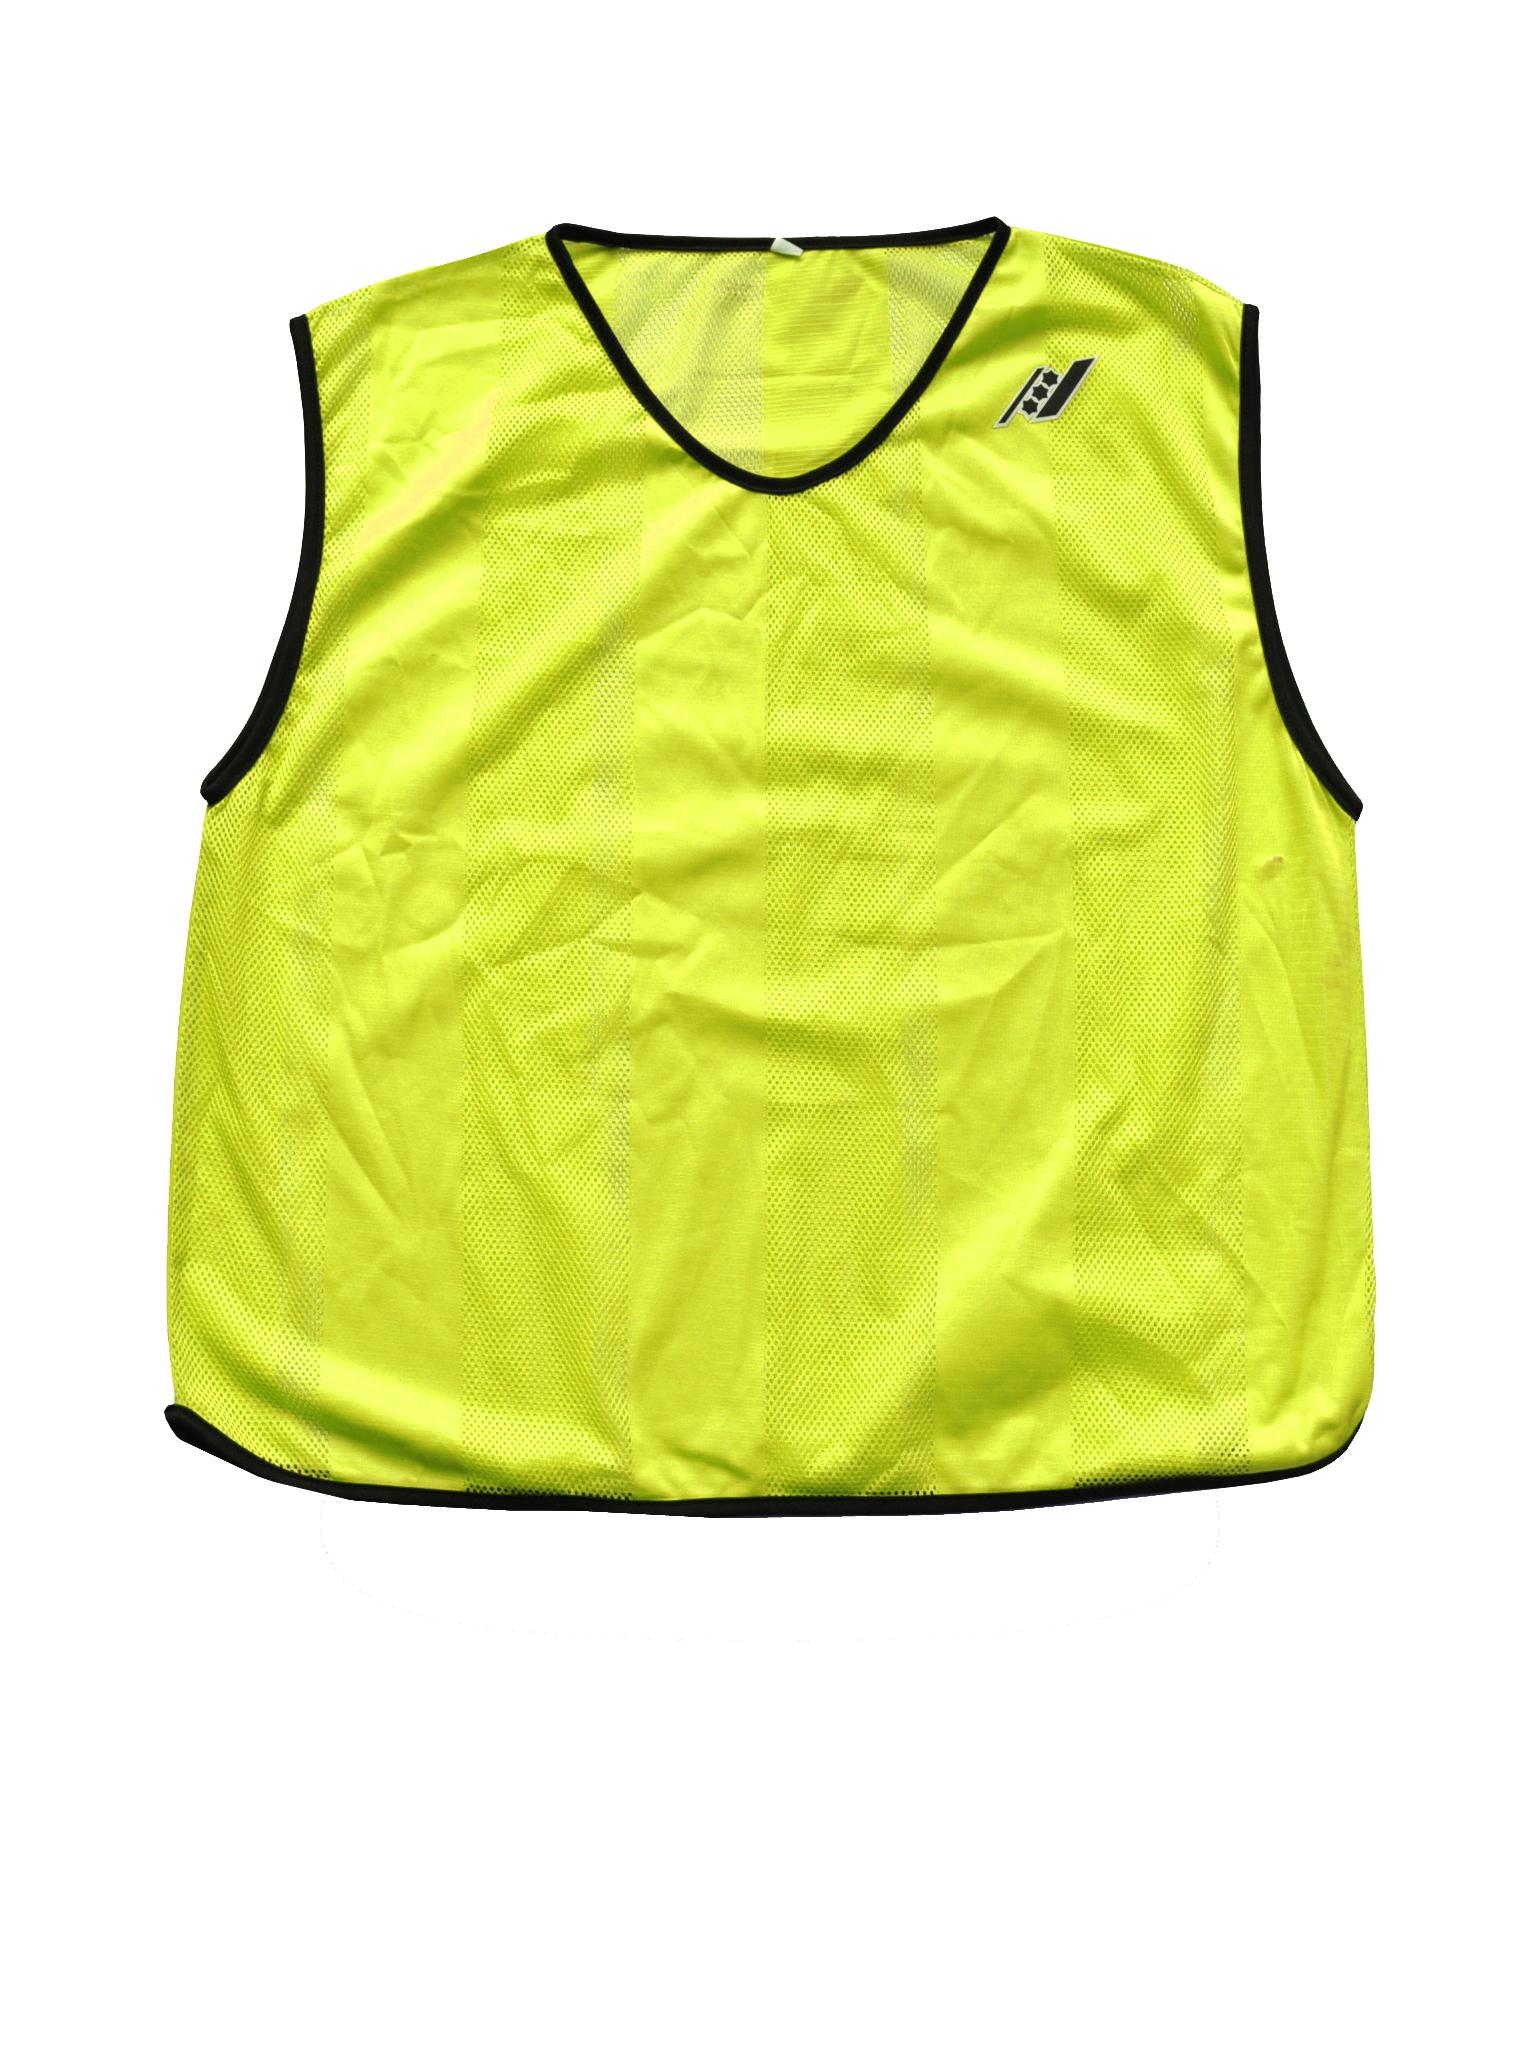 Image of   Rucanor Energy Training Vest - Neon Gul - Junior